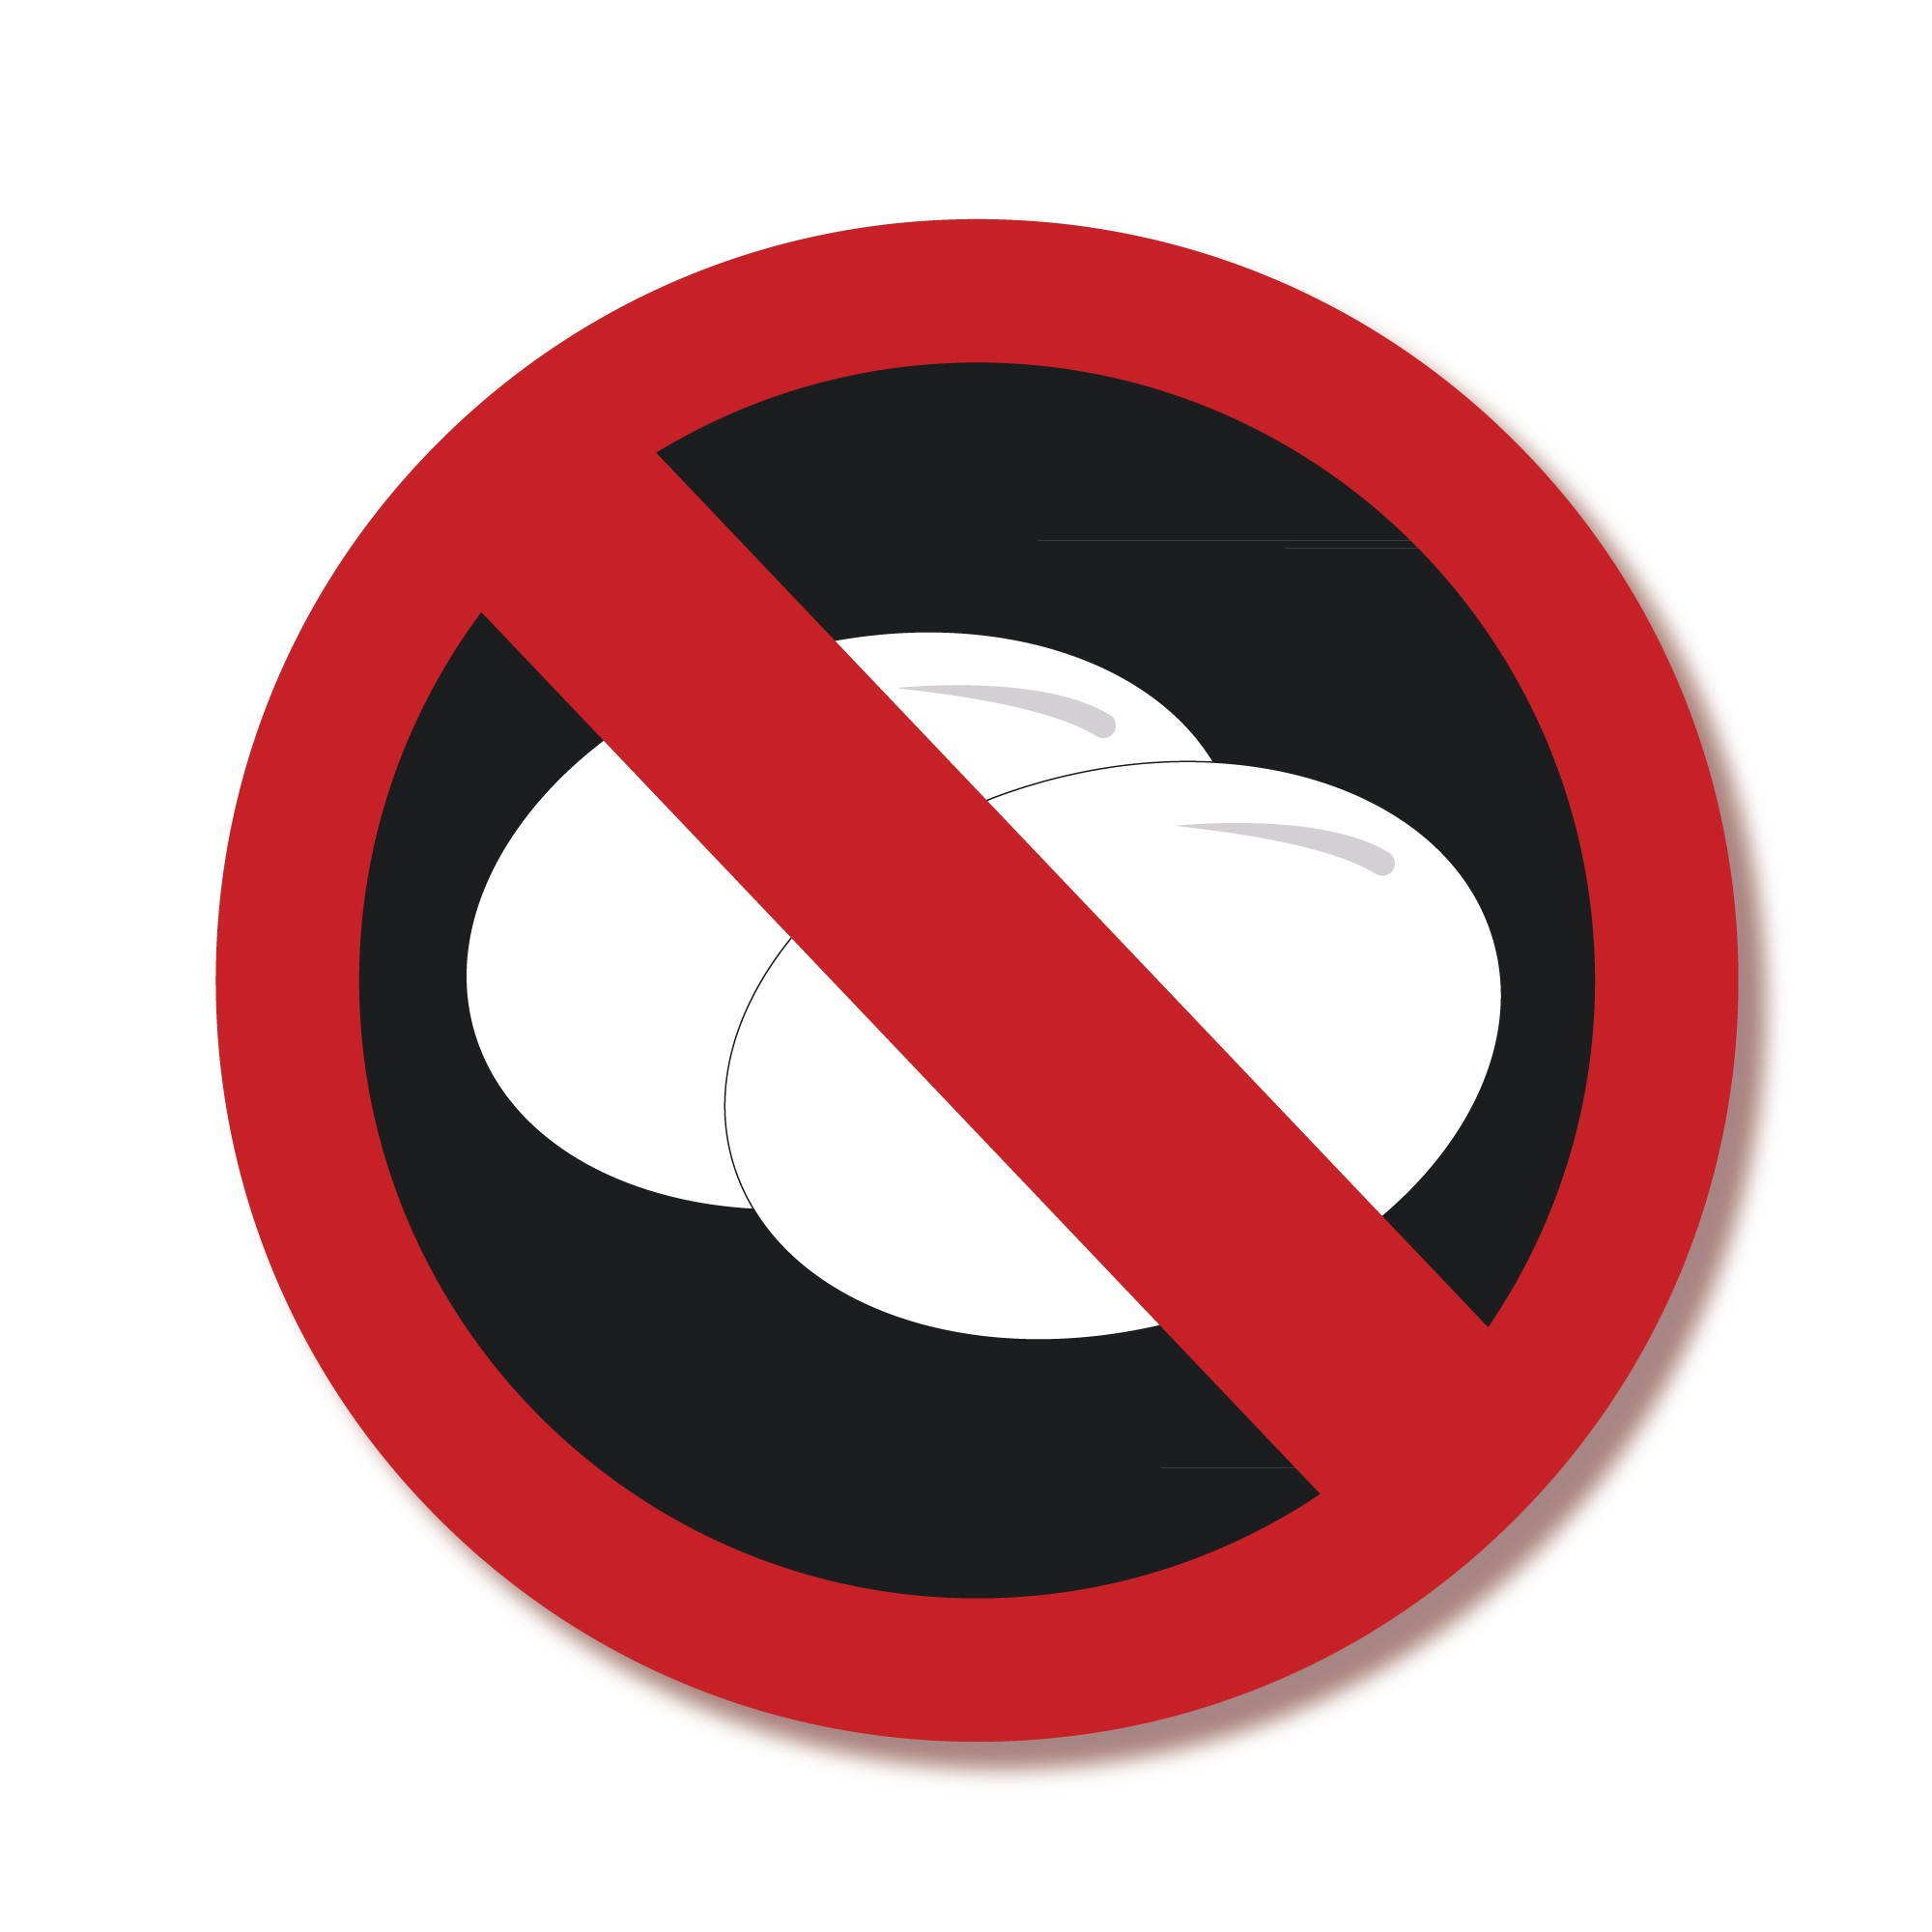 Allergy egg symbol clipart svg royalty free ALLGY-EGG Allergy Alert Labels - NO Eggs | Lovable Labels svg royalty free